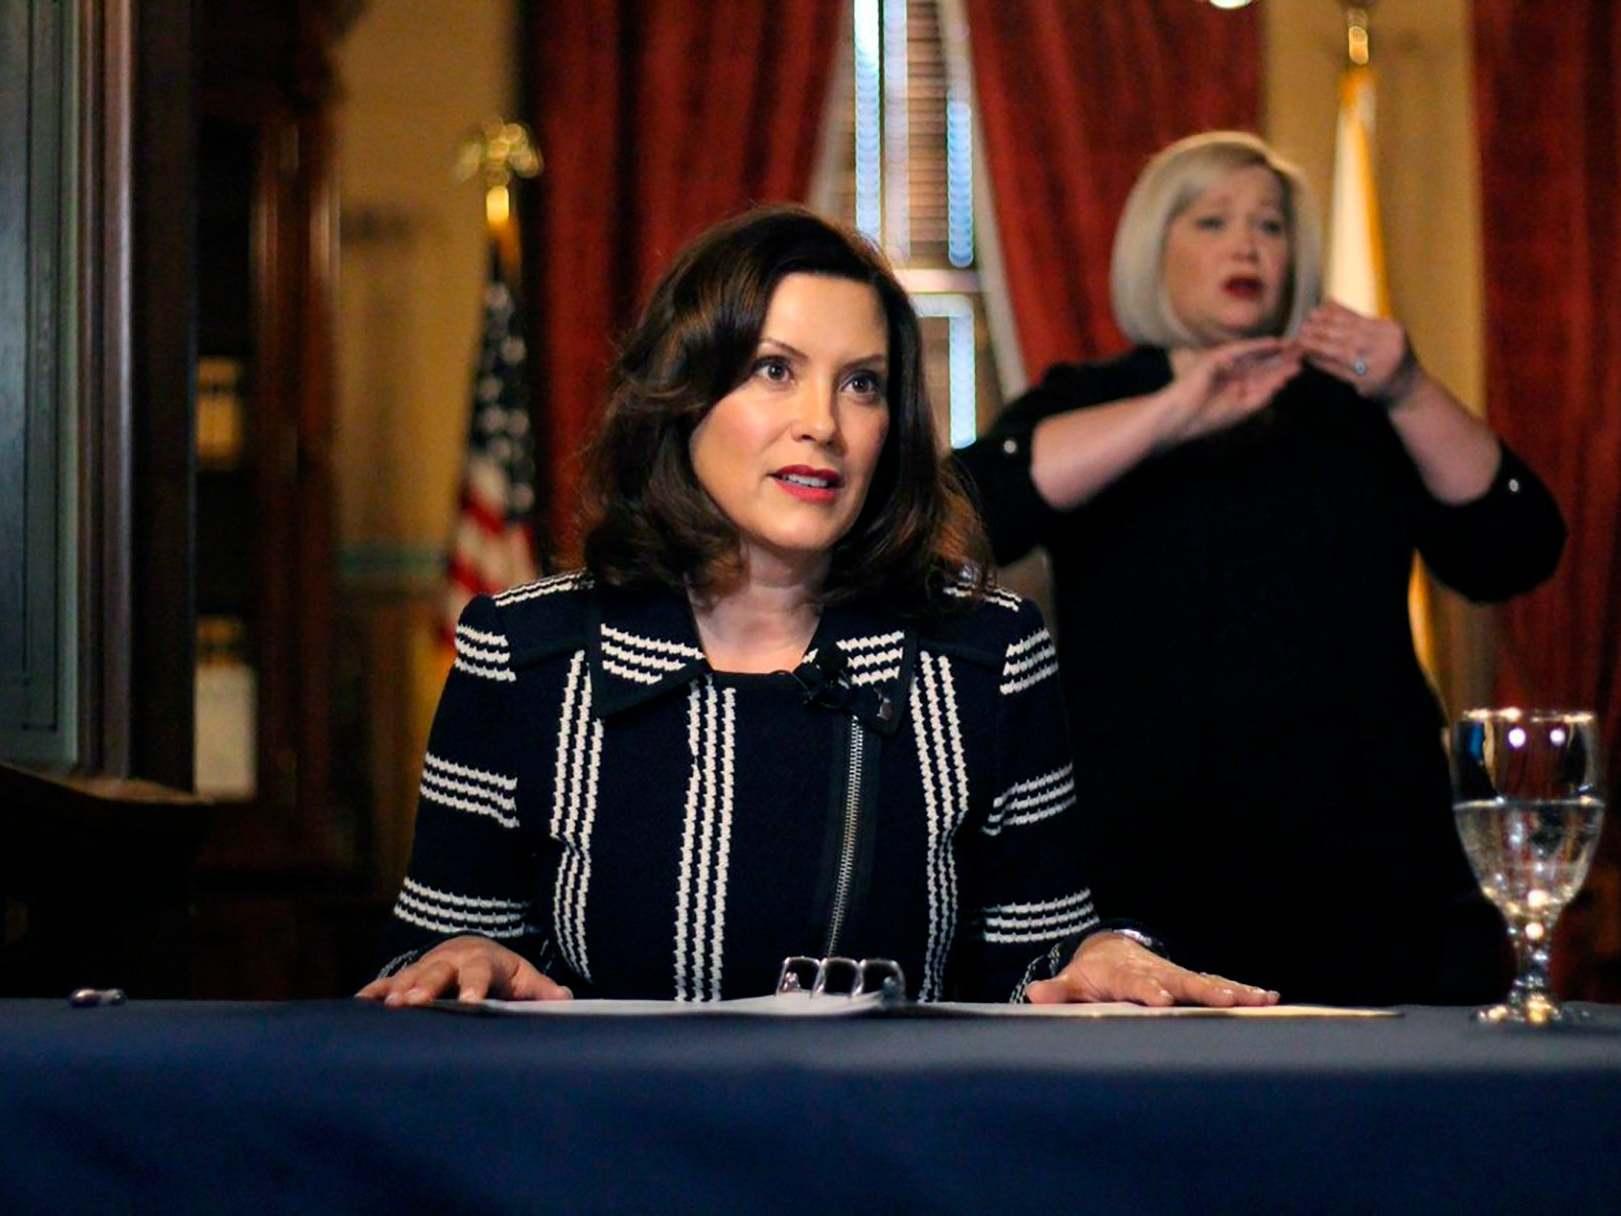 Michigan governor defends Biden over sexual assault claim: 'I know Joe' photo